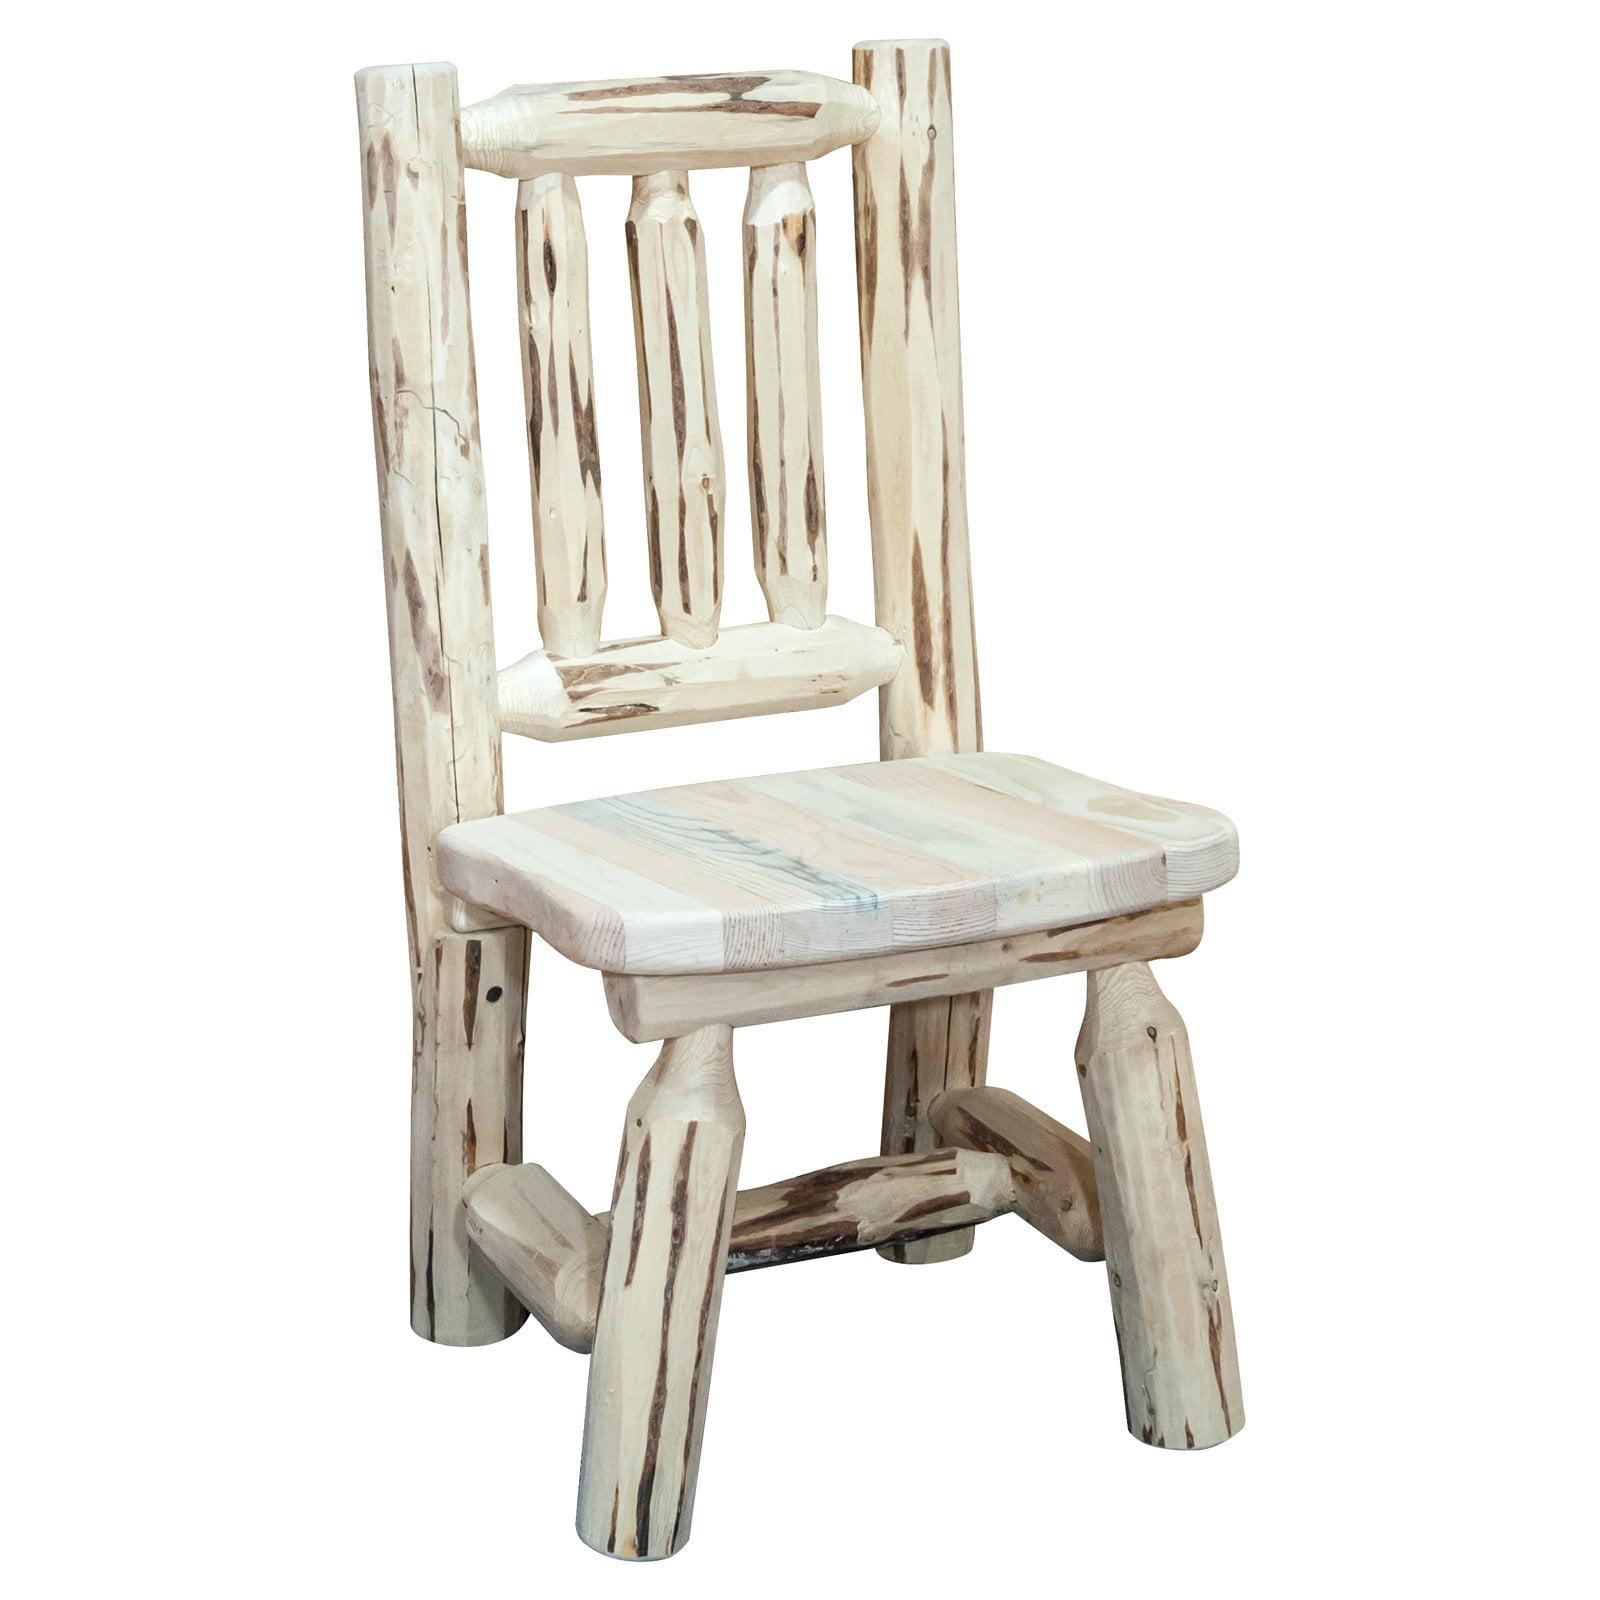 Montana Woodworks Montana Kids Chair